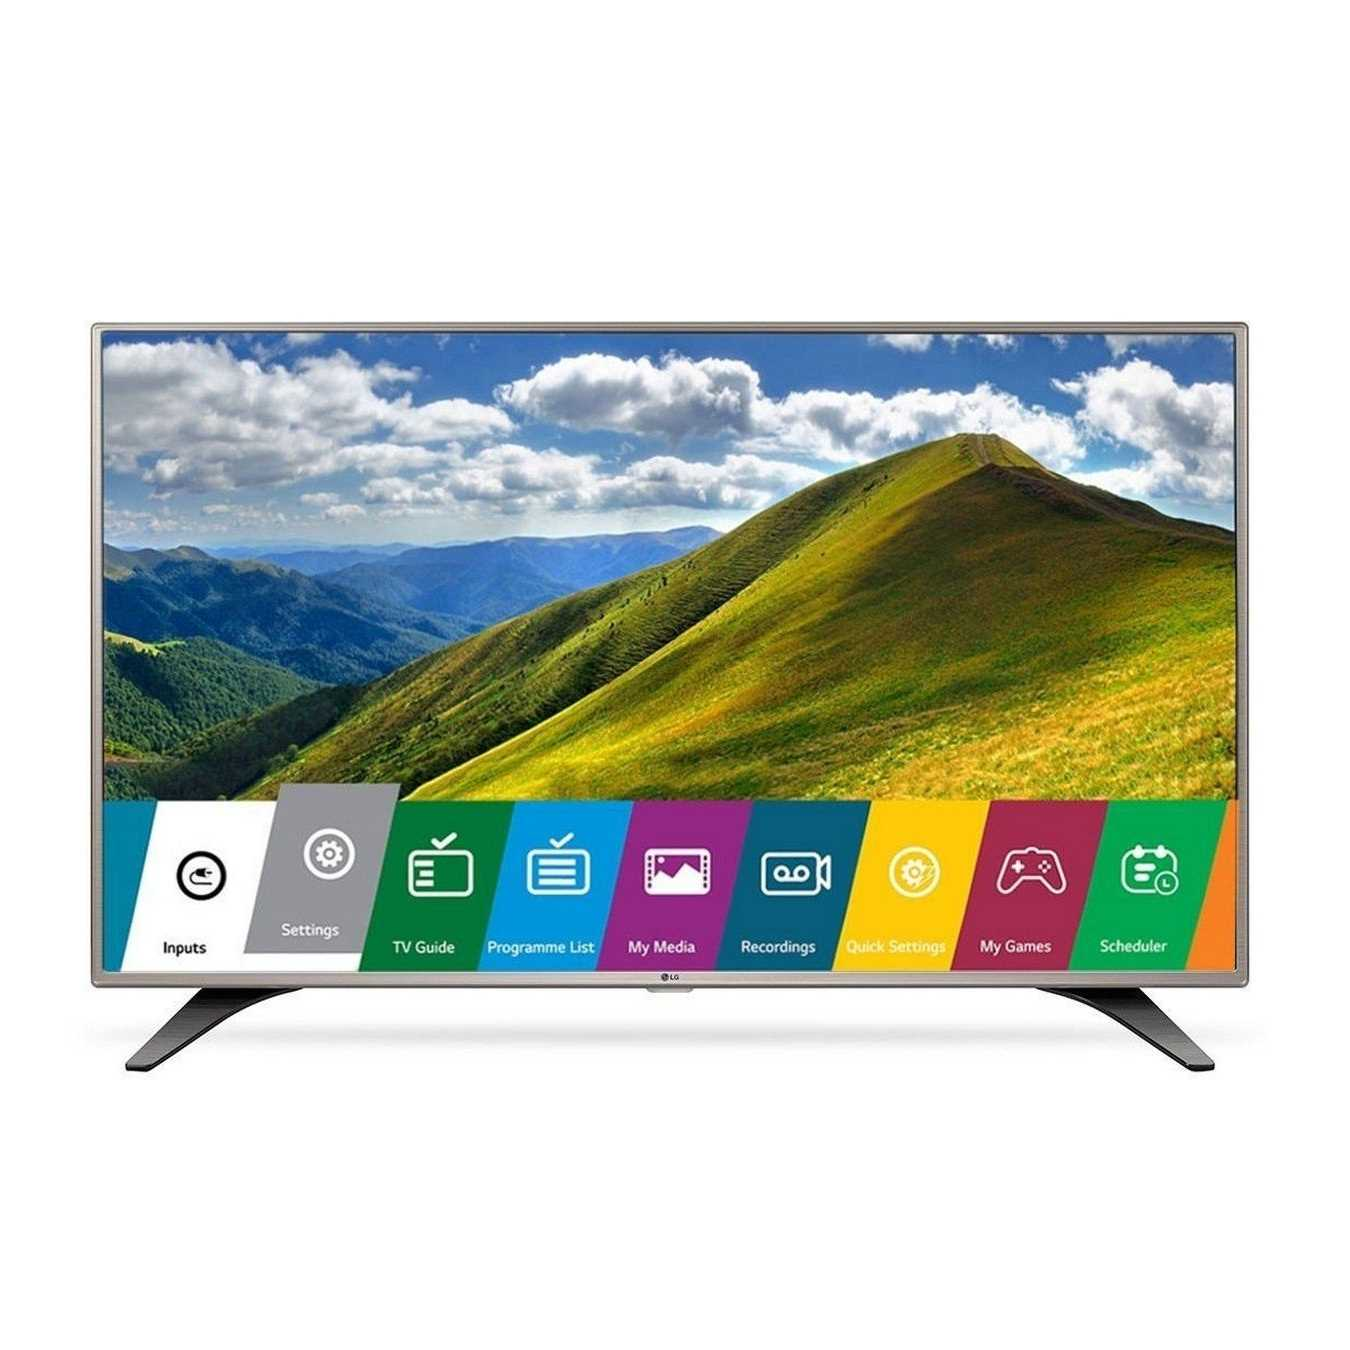 LG 32LJ530D 32 Inch HD Ready LED Television